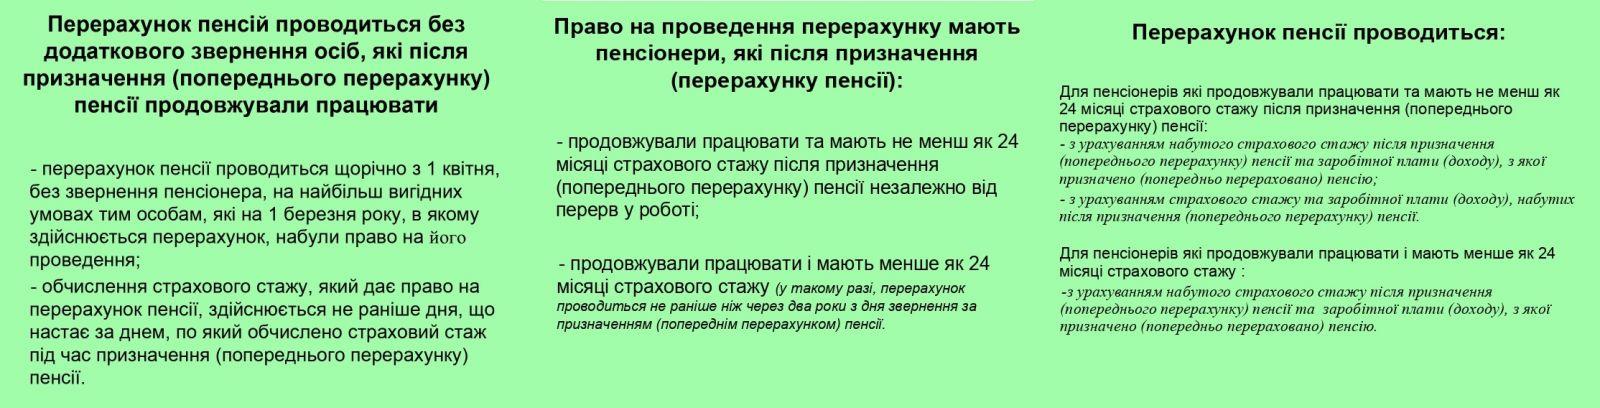 Пенсия с 1 марта 2019 года в России. Индексация, последние новости изоражения